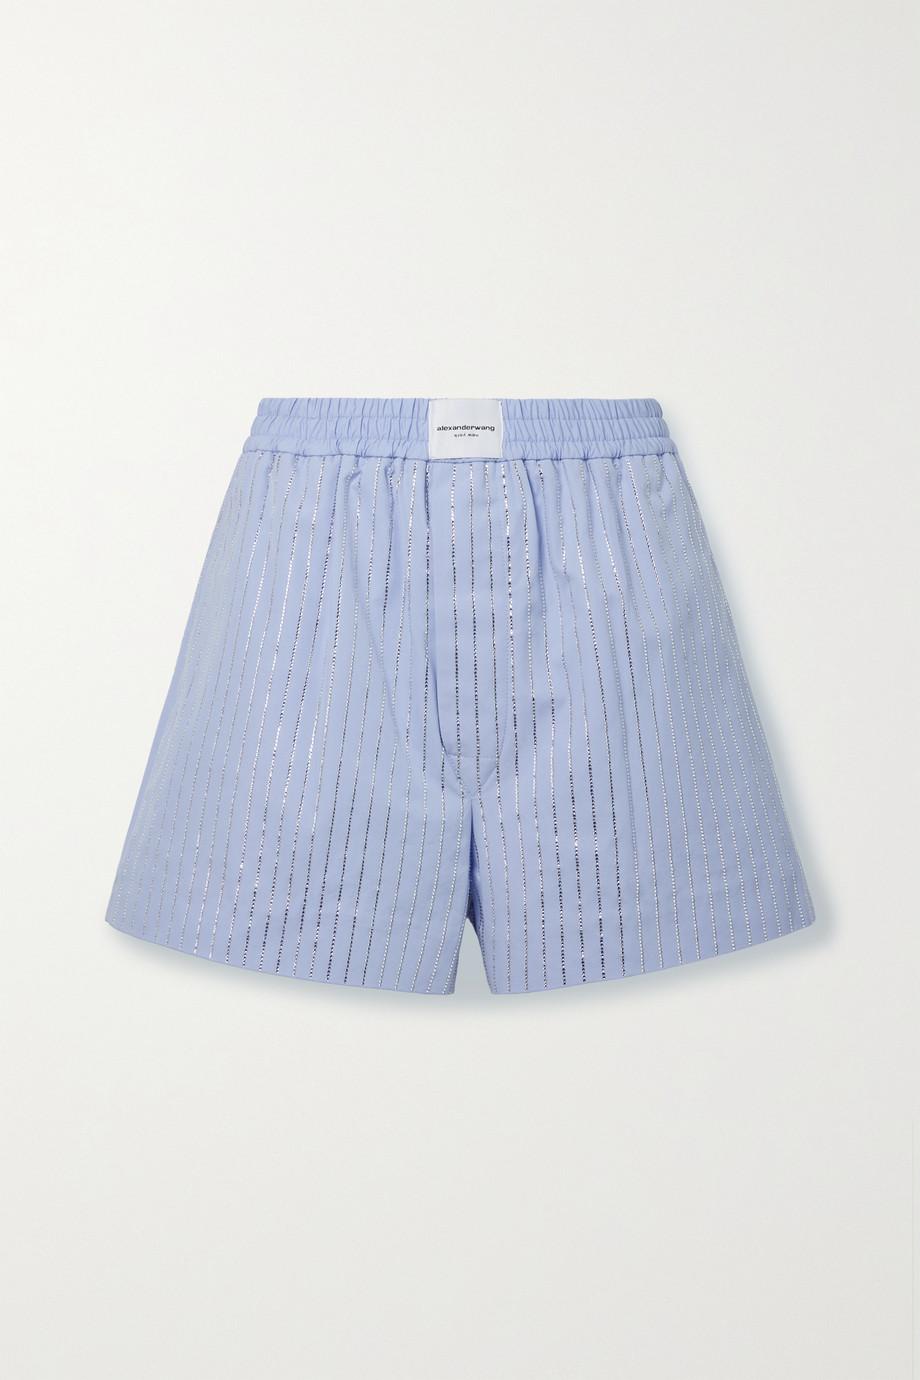 Alexander Wang Athena crystal-embellished cotton-poplin shorts